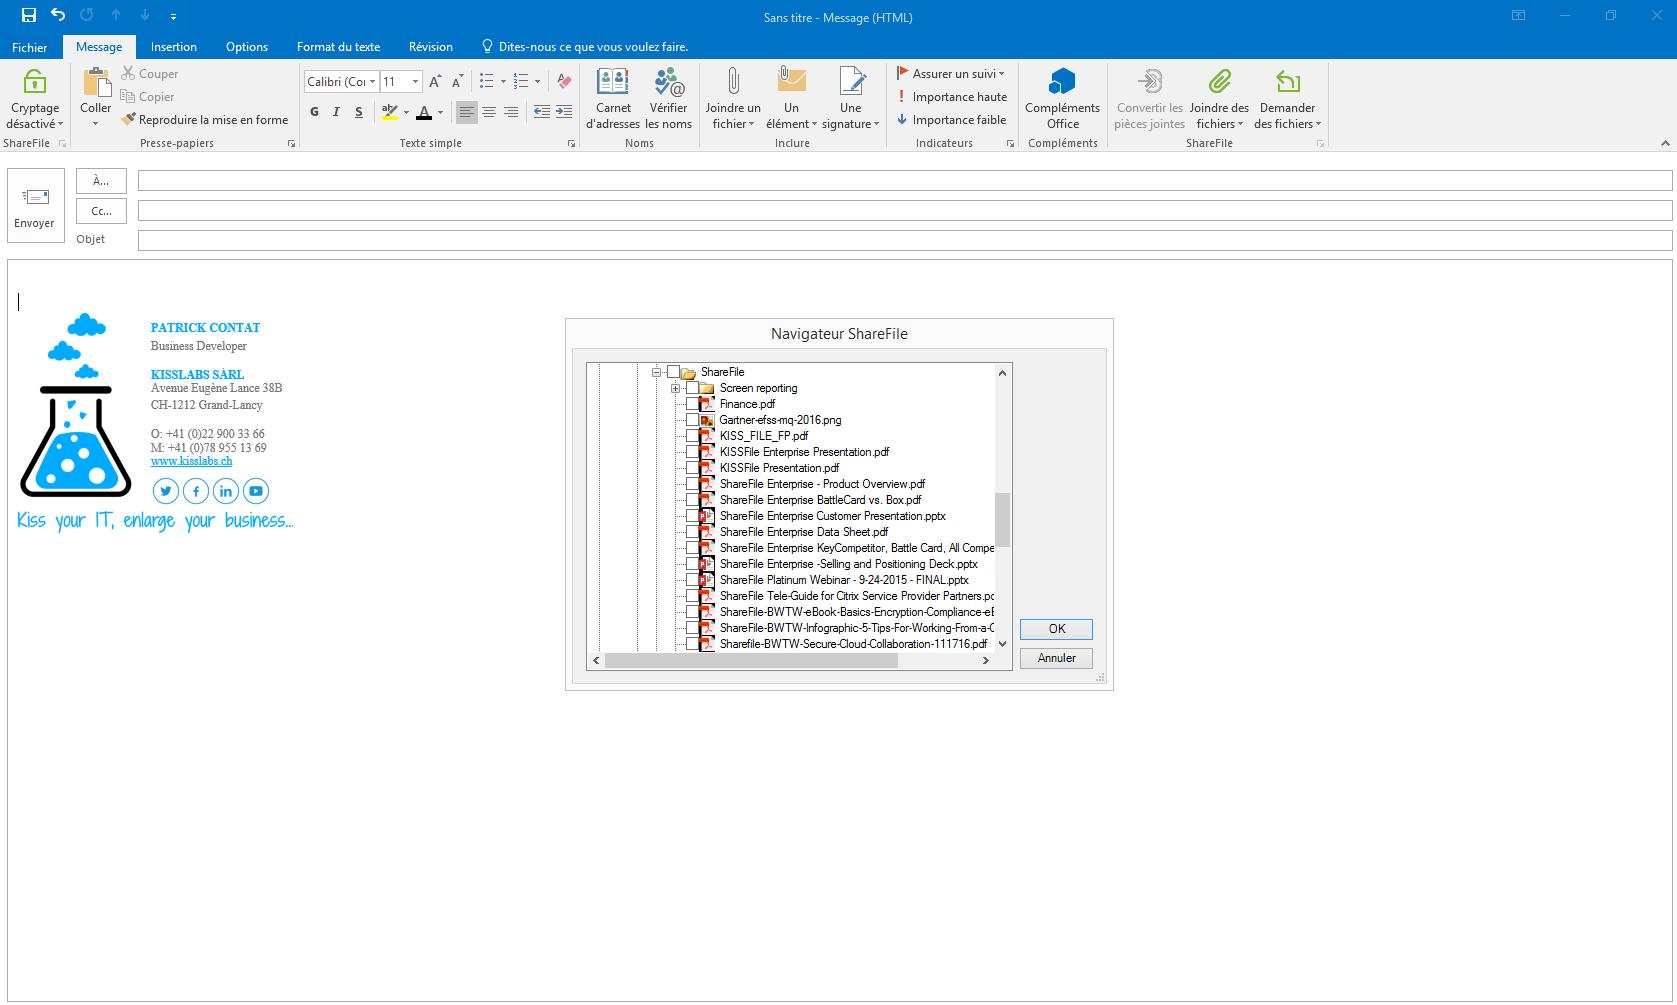 KissFile - Citrix ShareFile - Share File via Outlook storage location